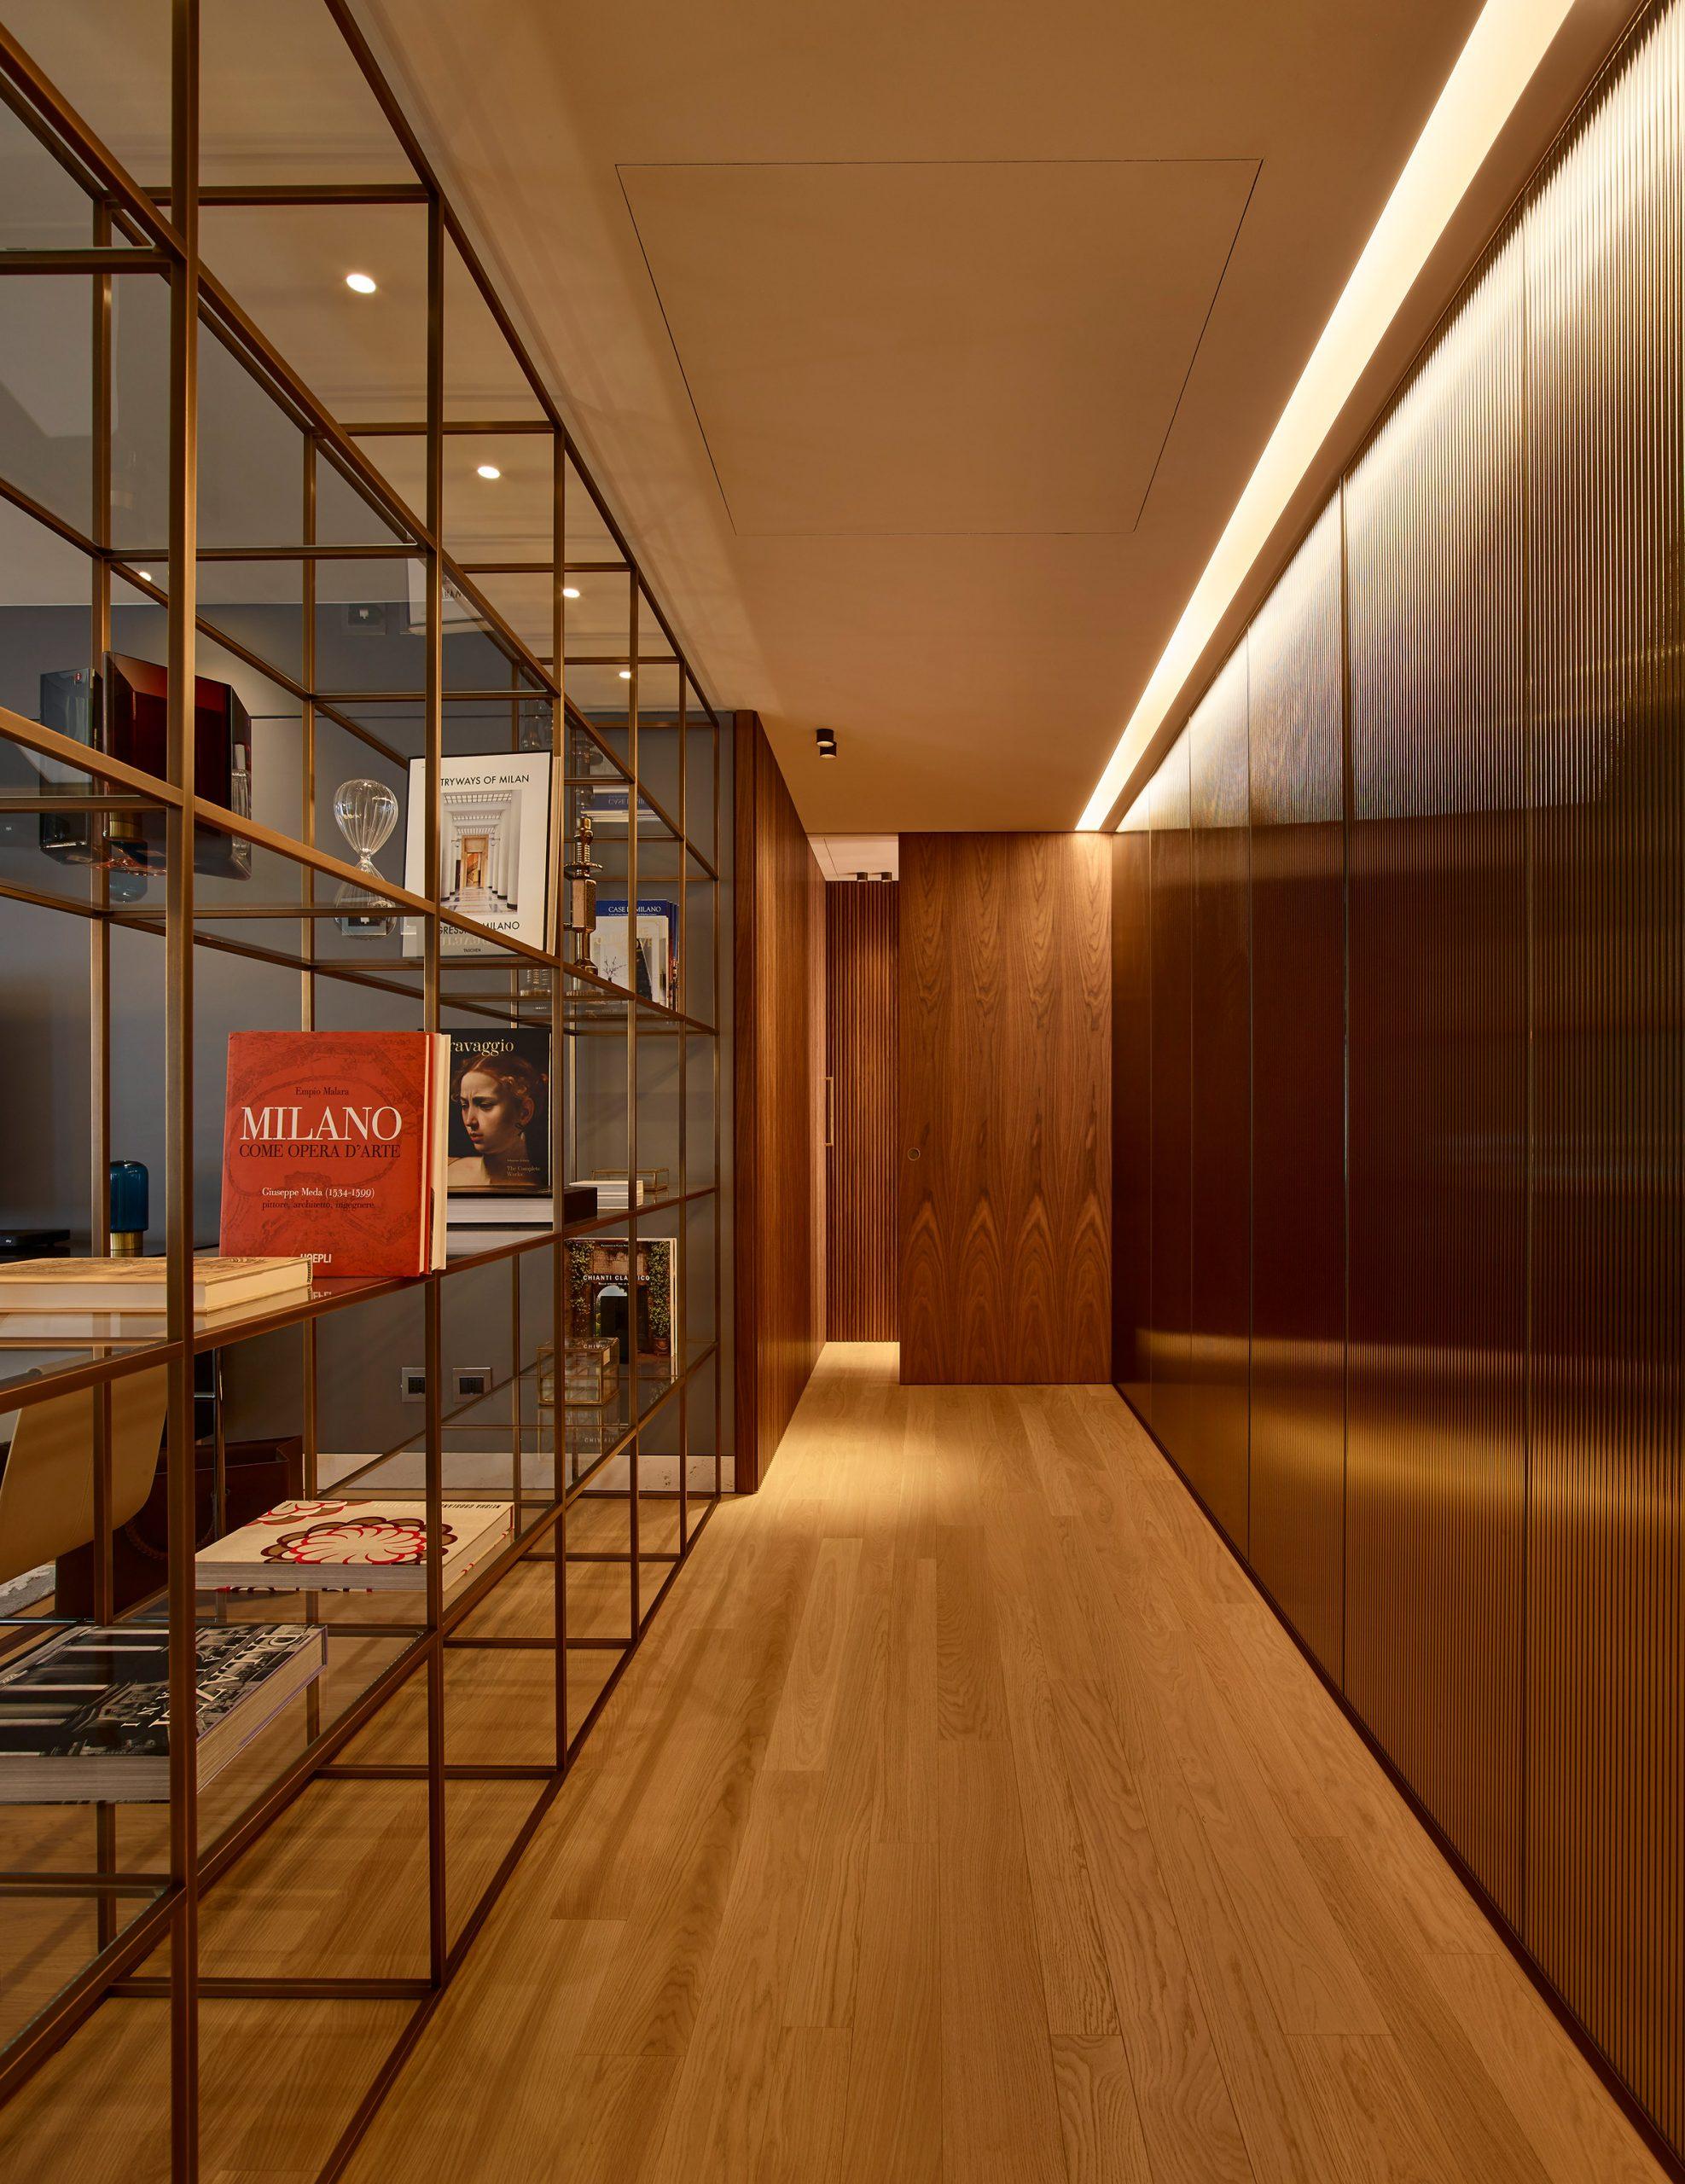 Wood-clad corridor by Lualdi